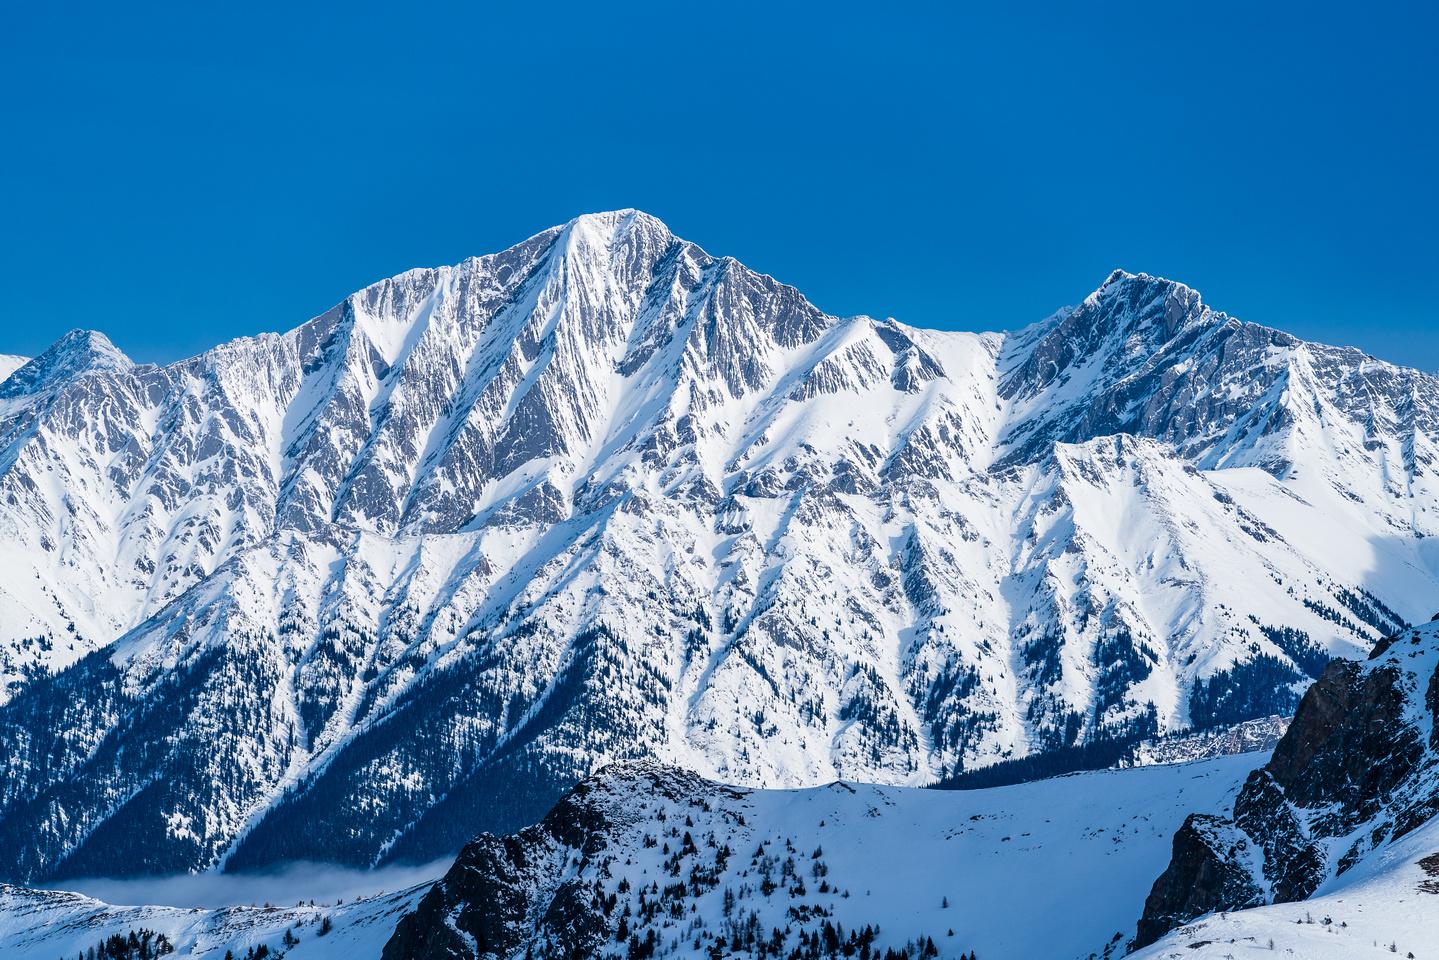 Mystic Peak. Robb completed an FA of the left skyline ridge.